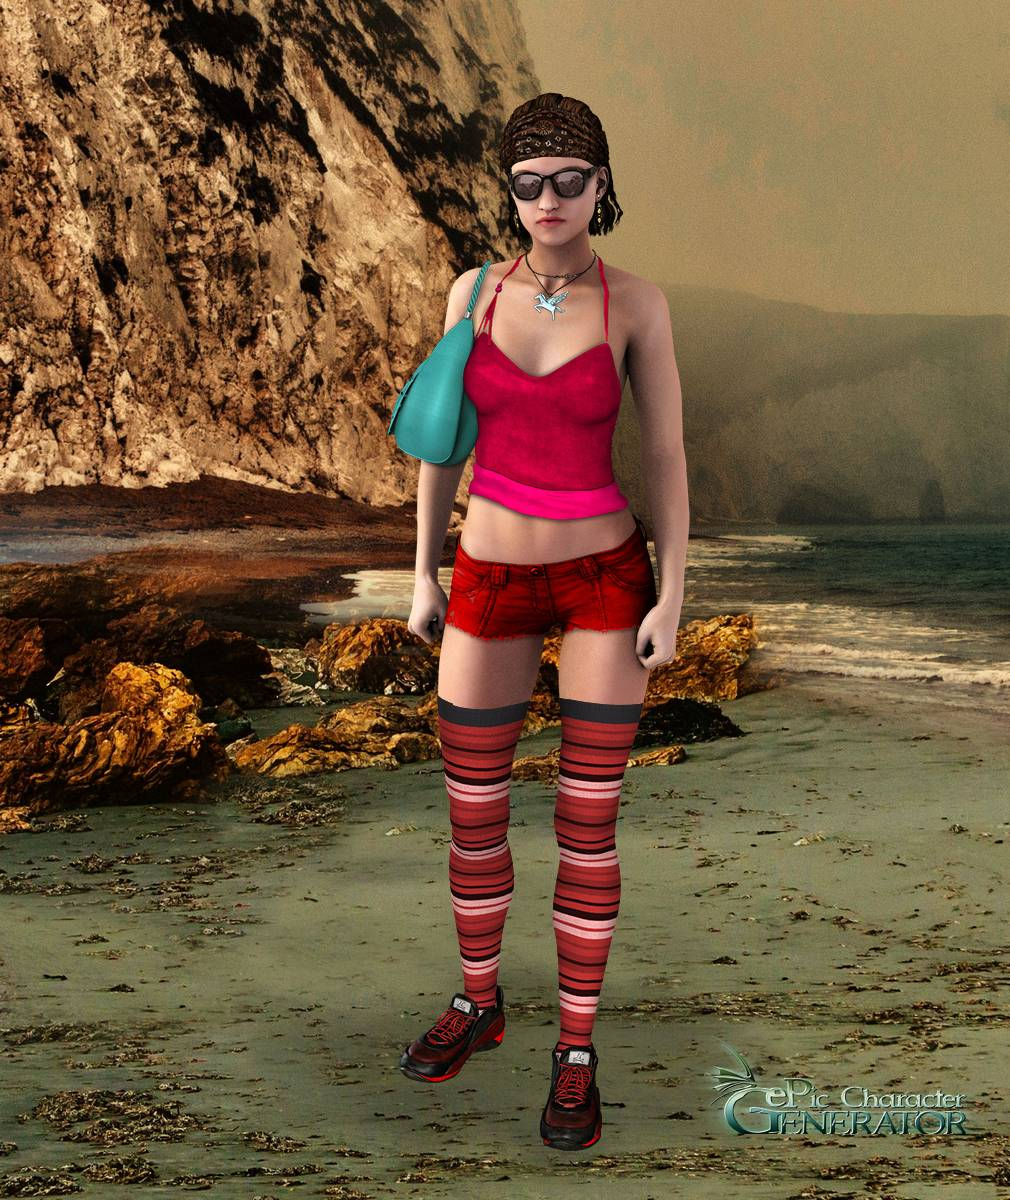 ePic Character Generator Season 2 Female Modern Screenshot 08